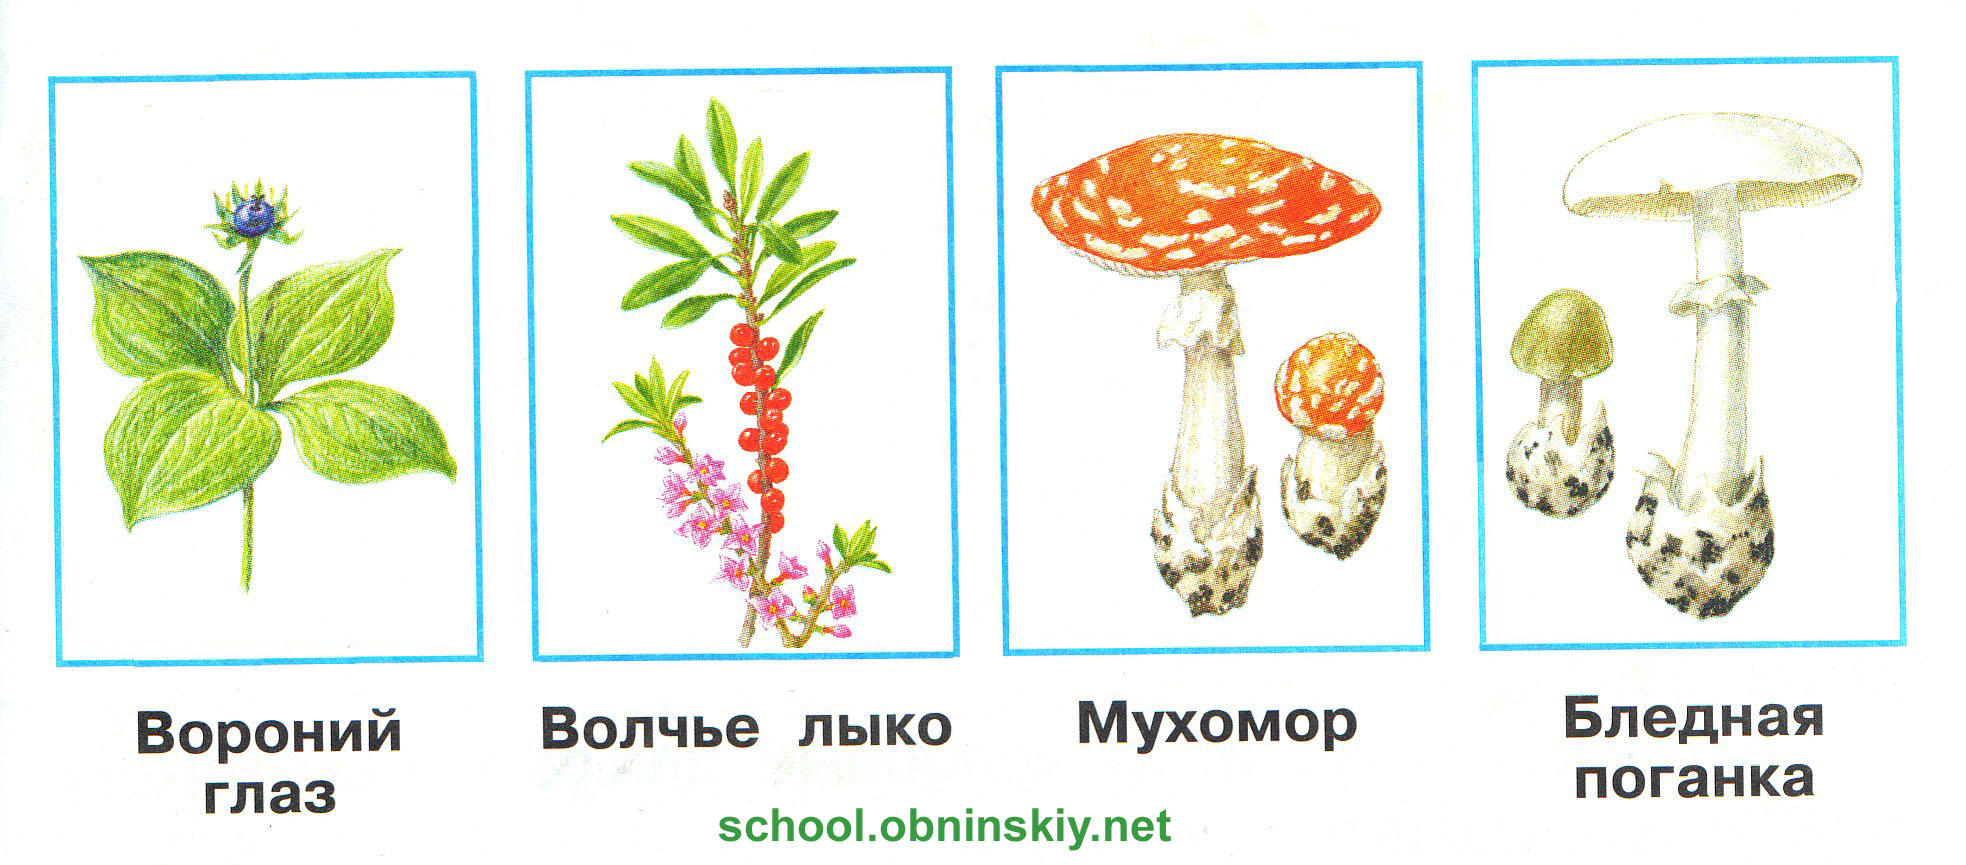 Описание: http://school.obninskiy.net/data/uploads/okr_mir/okrmir_kl2_ch2_16.jpg